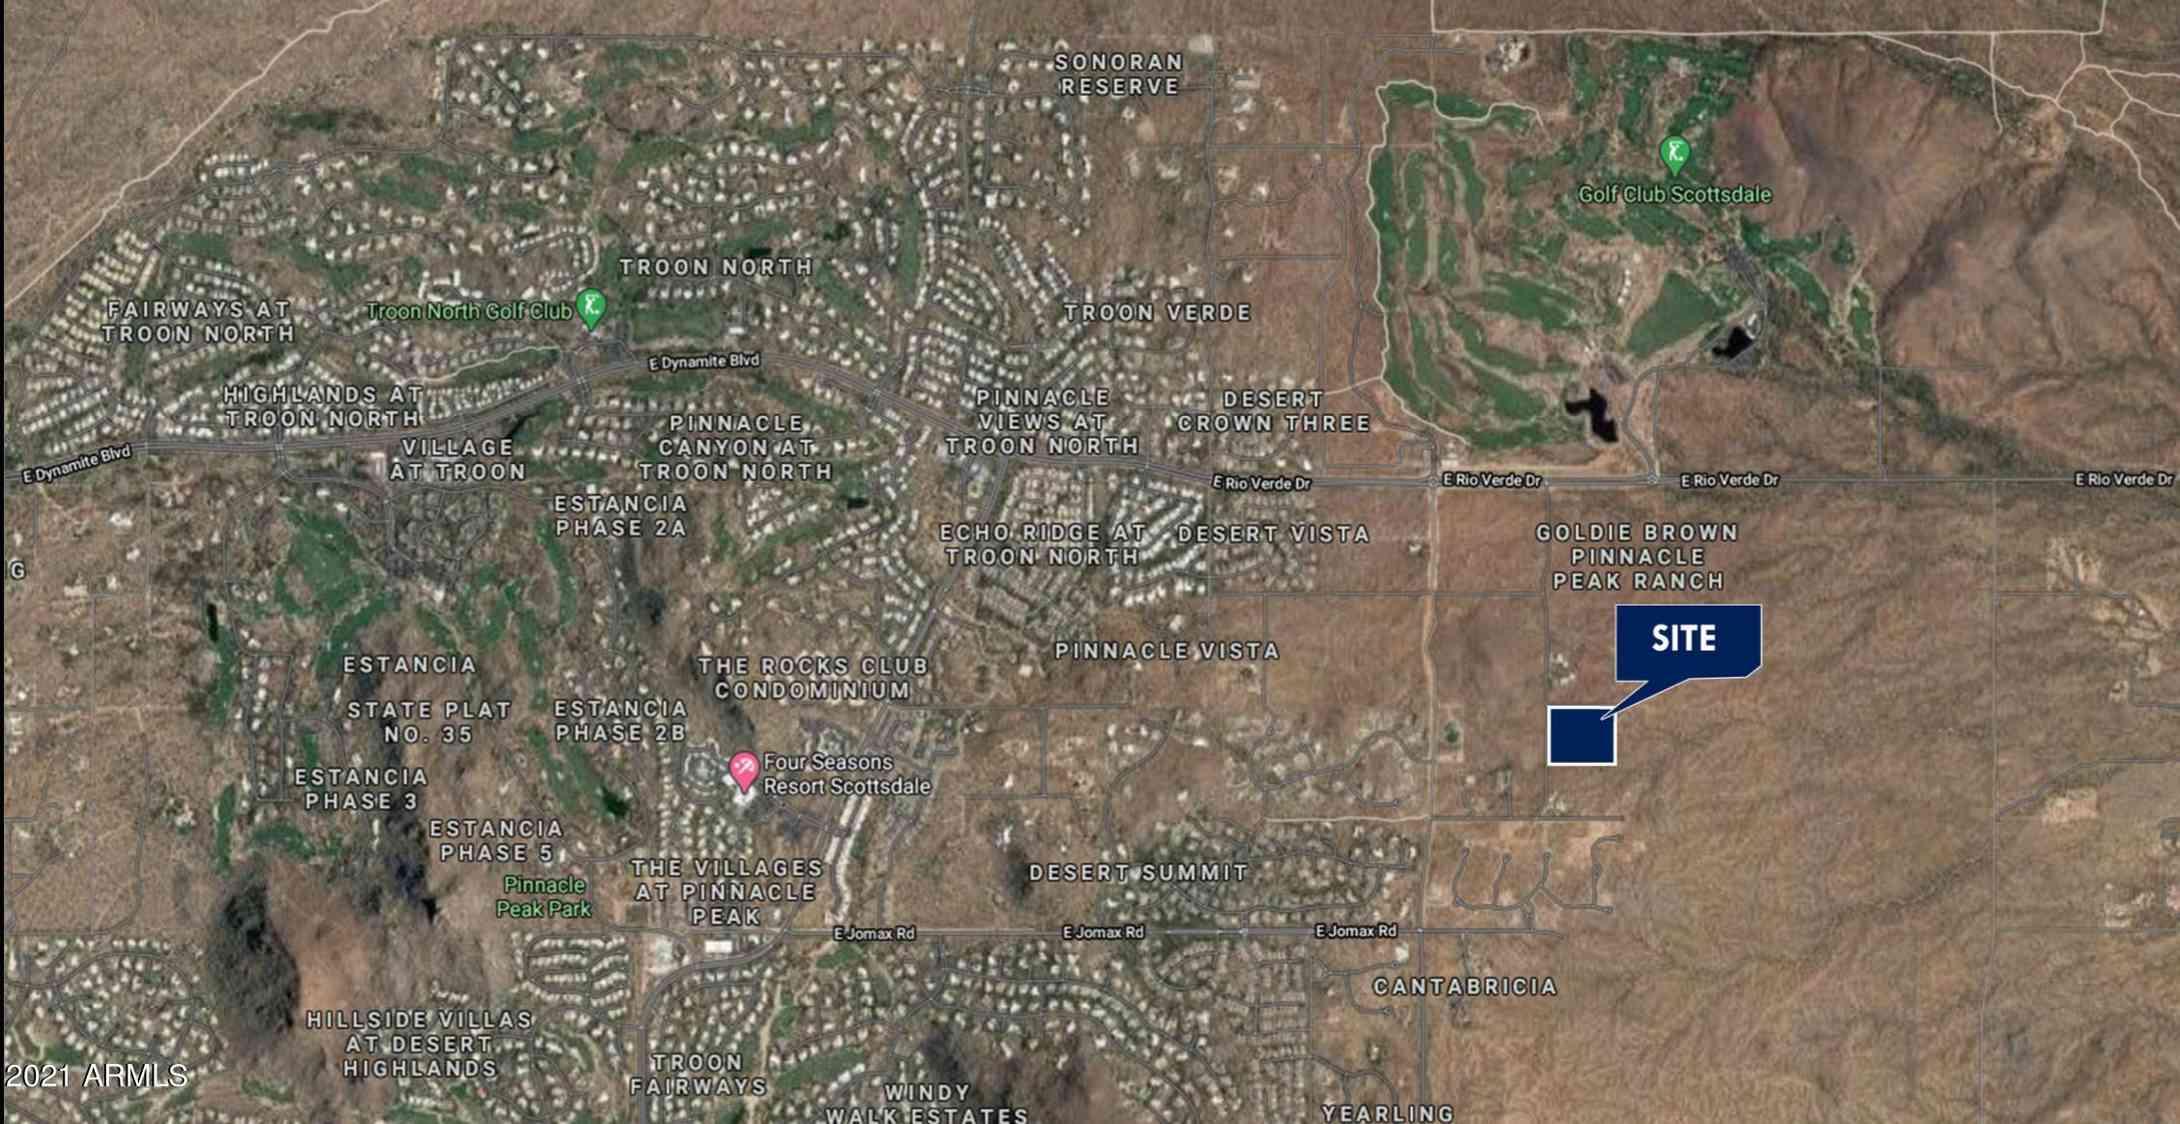 0 120TH ST & PINNACLE VISTA DR -- #14, Scottsdale, AZ, 85262,